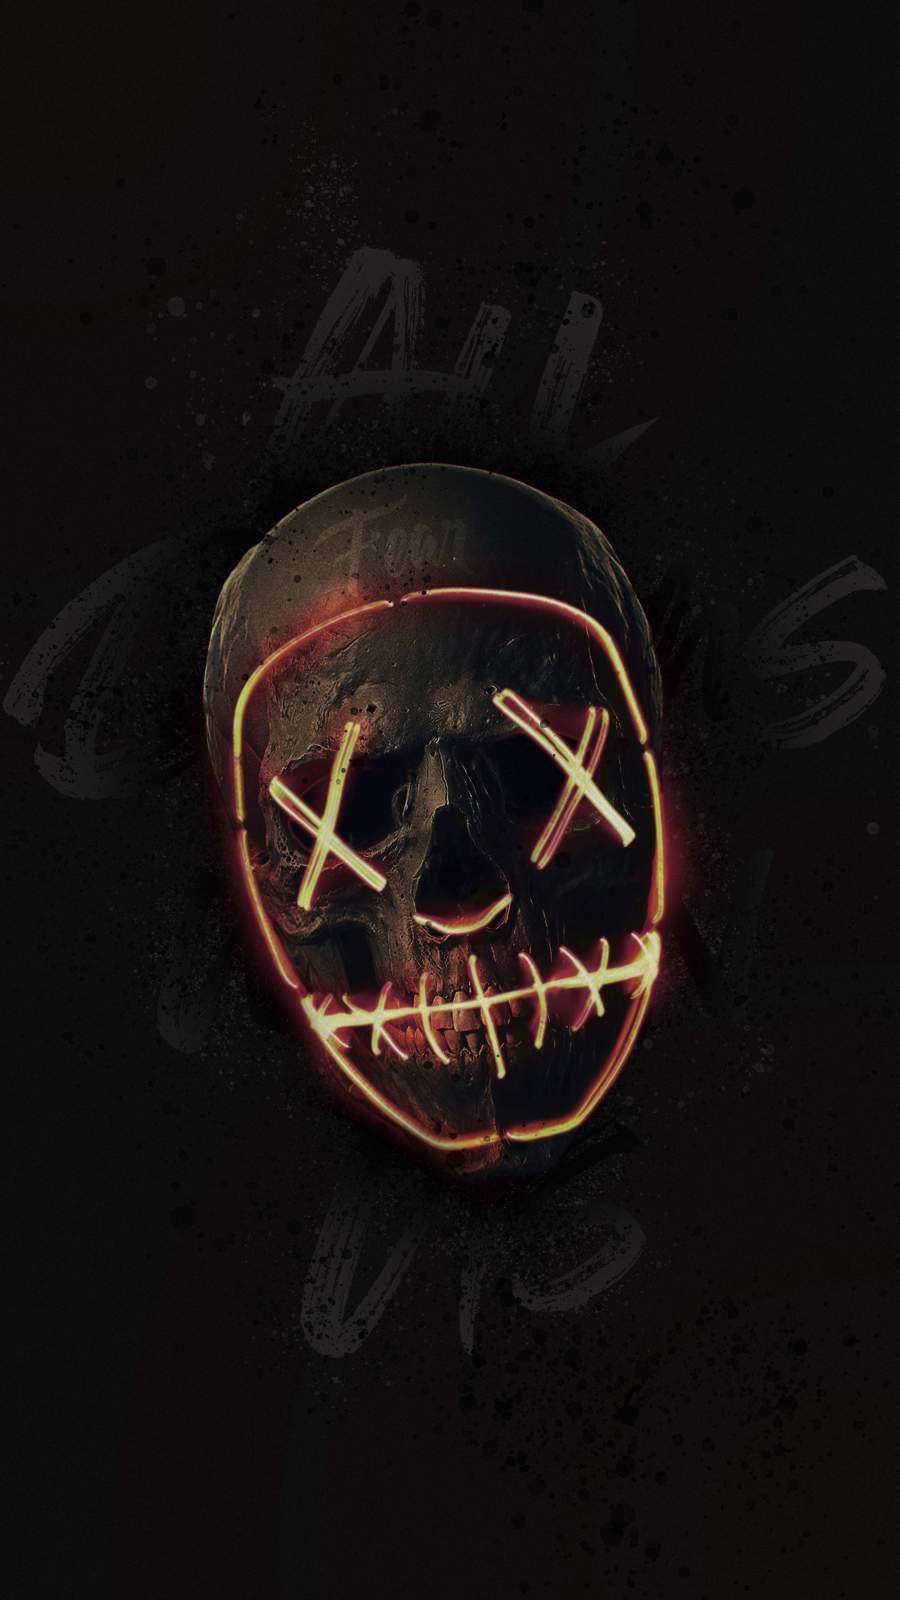 Black Skull iPhone Wallpaper